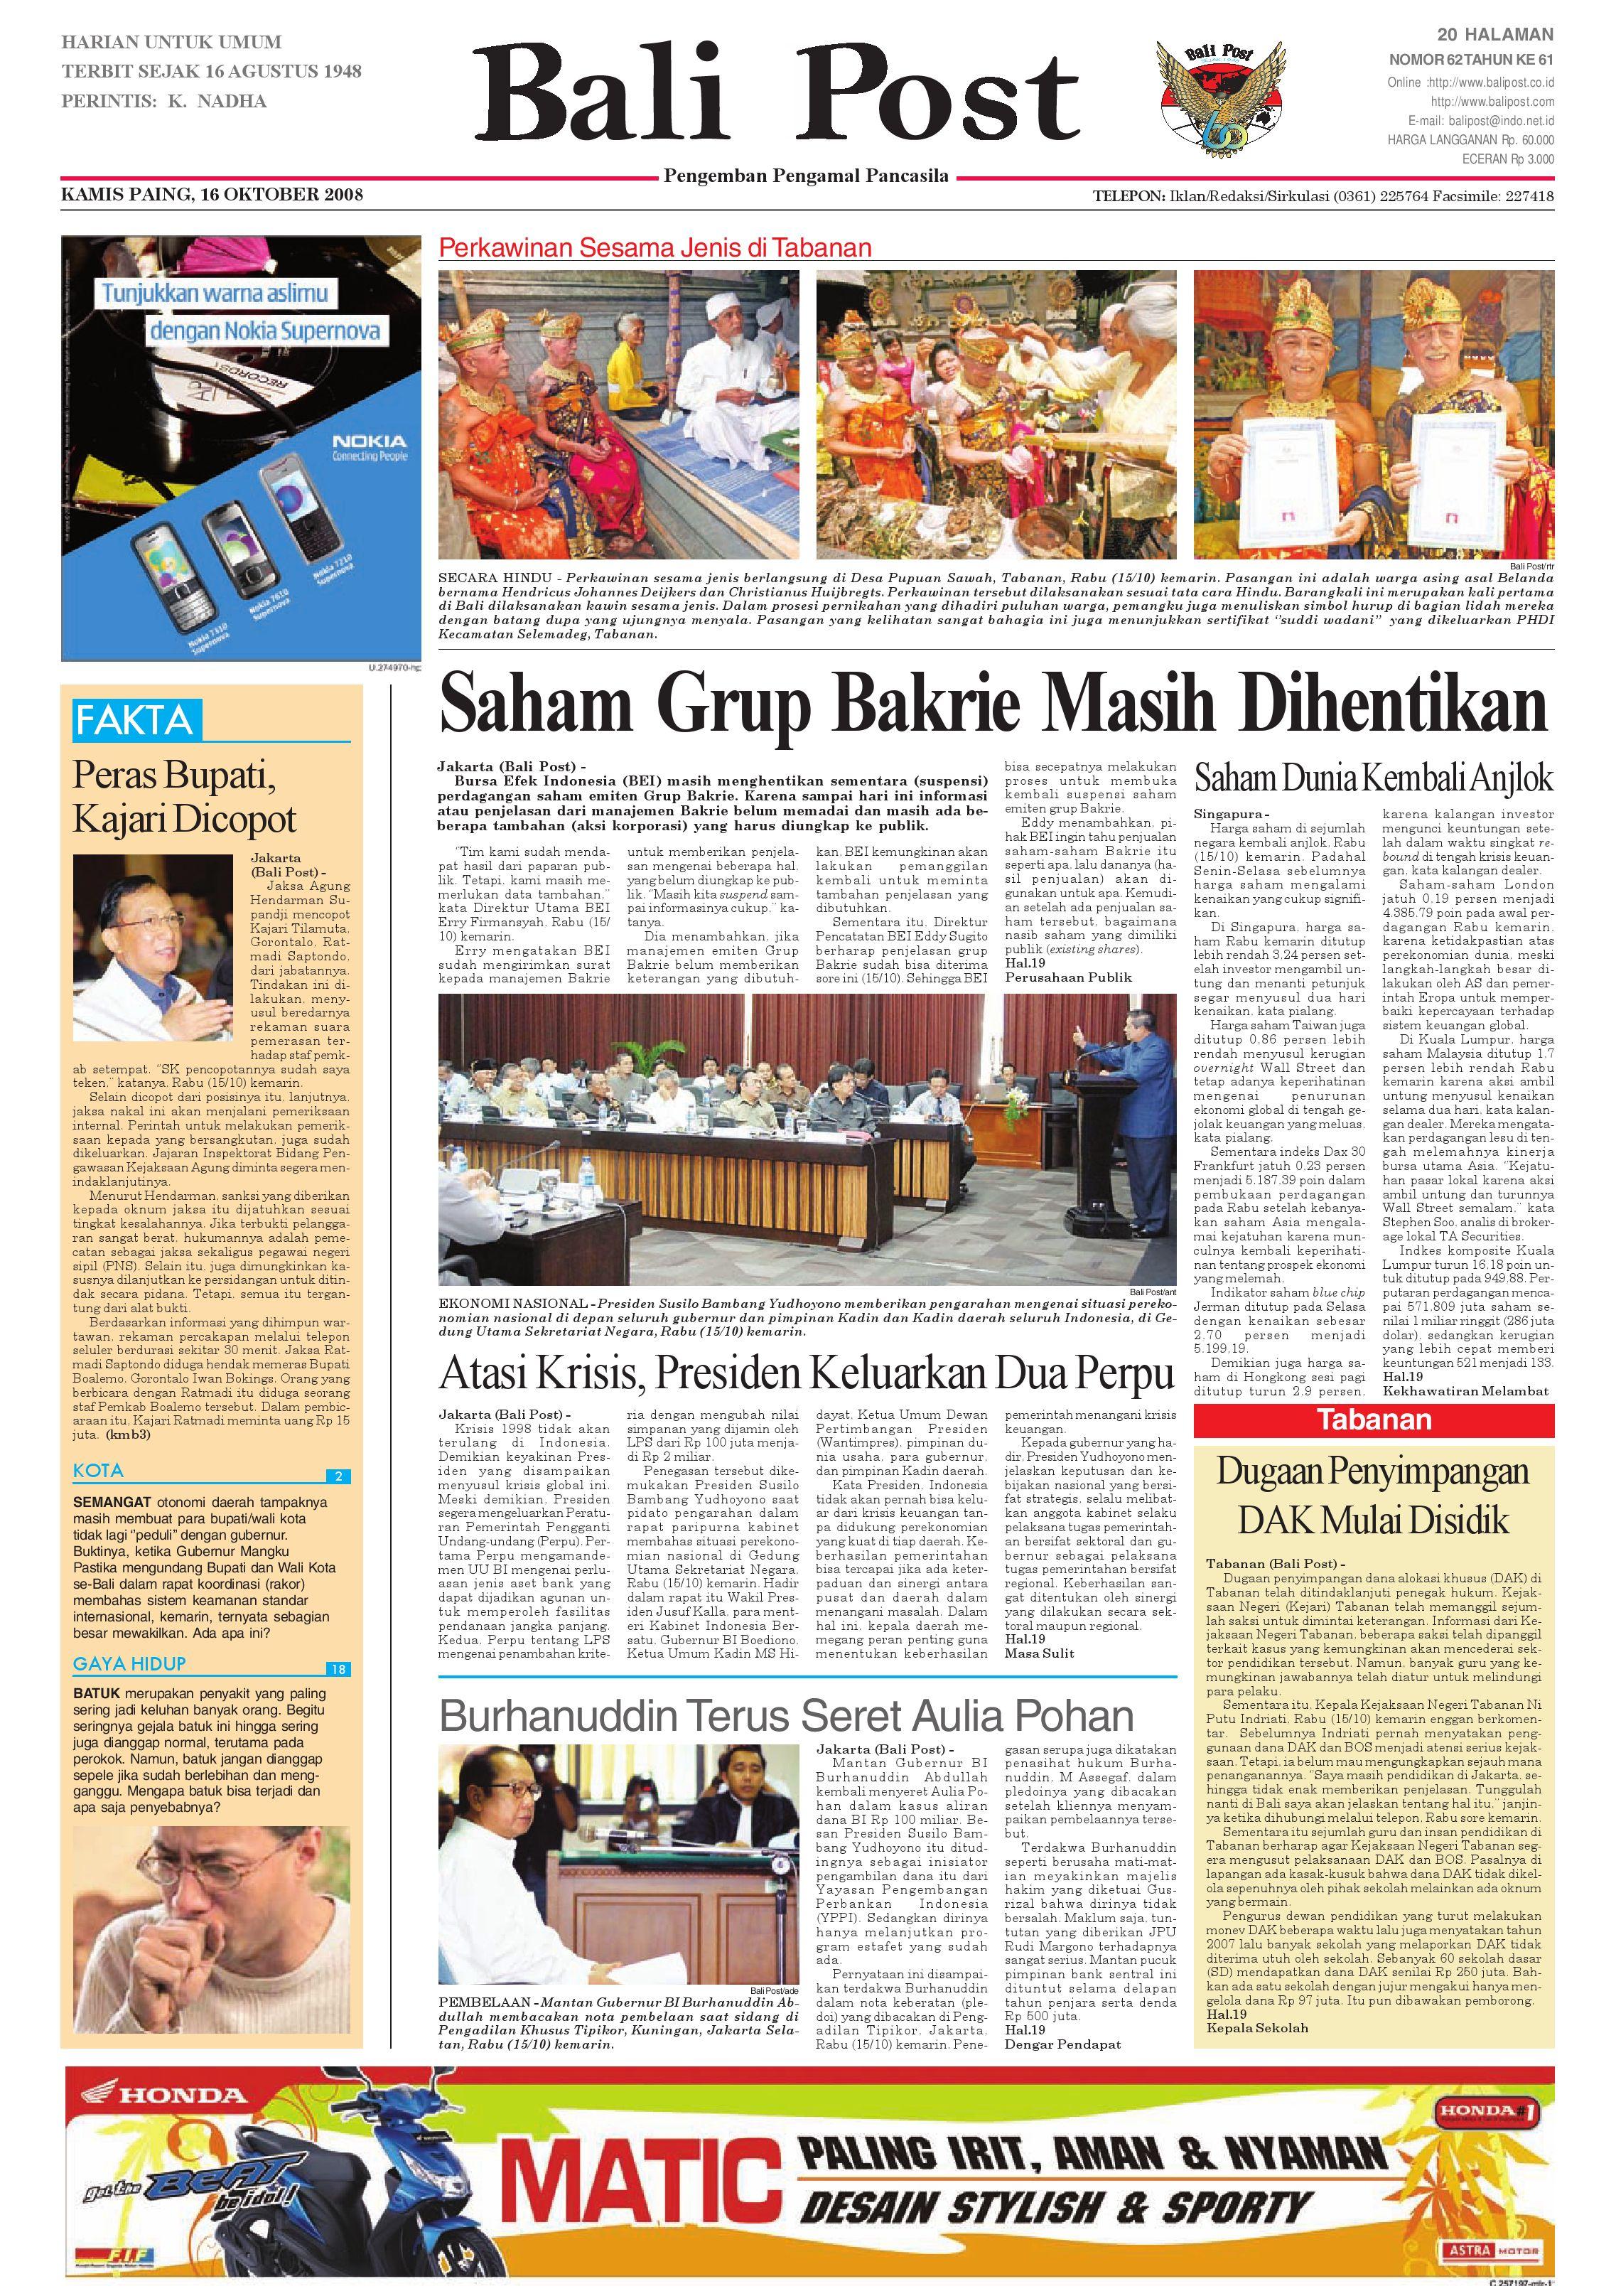 Bali Post Kamis 16 Oktober 2008 By E Paper KMB Issuu